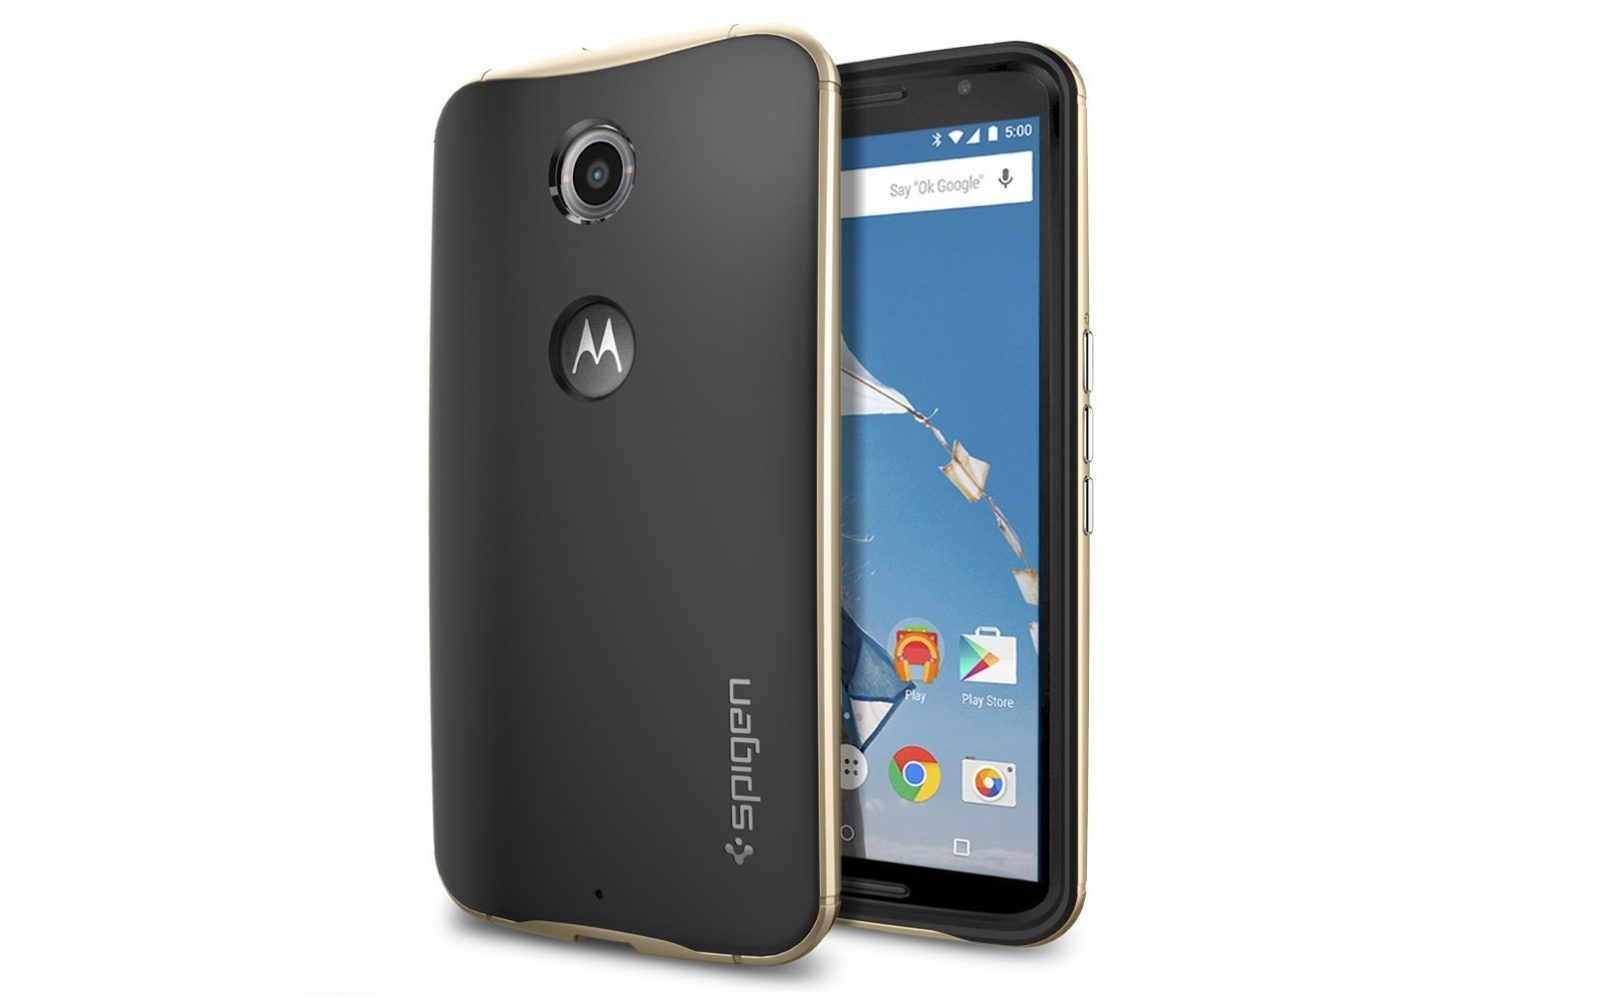 new product 298d3 d706e Deal: Spigen Hybrid/Wallet/Thin Fit Nexus 6 cases from $3.50 shipped ...